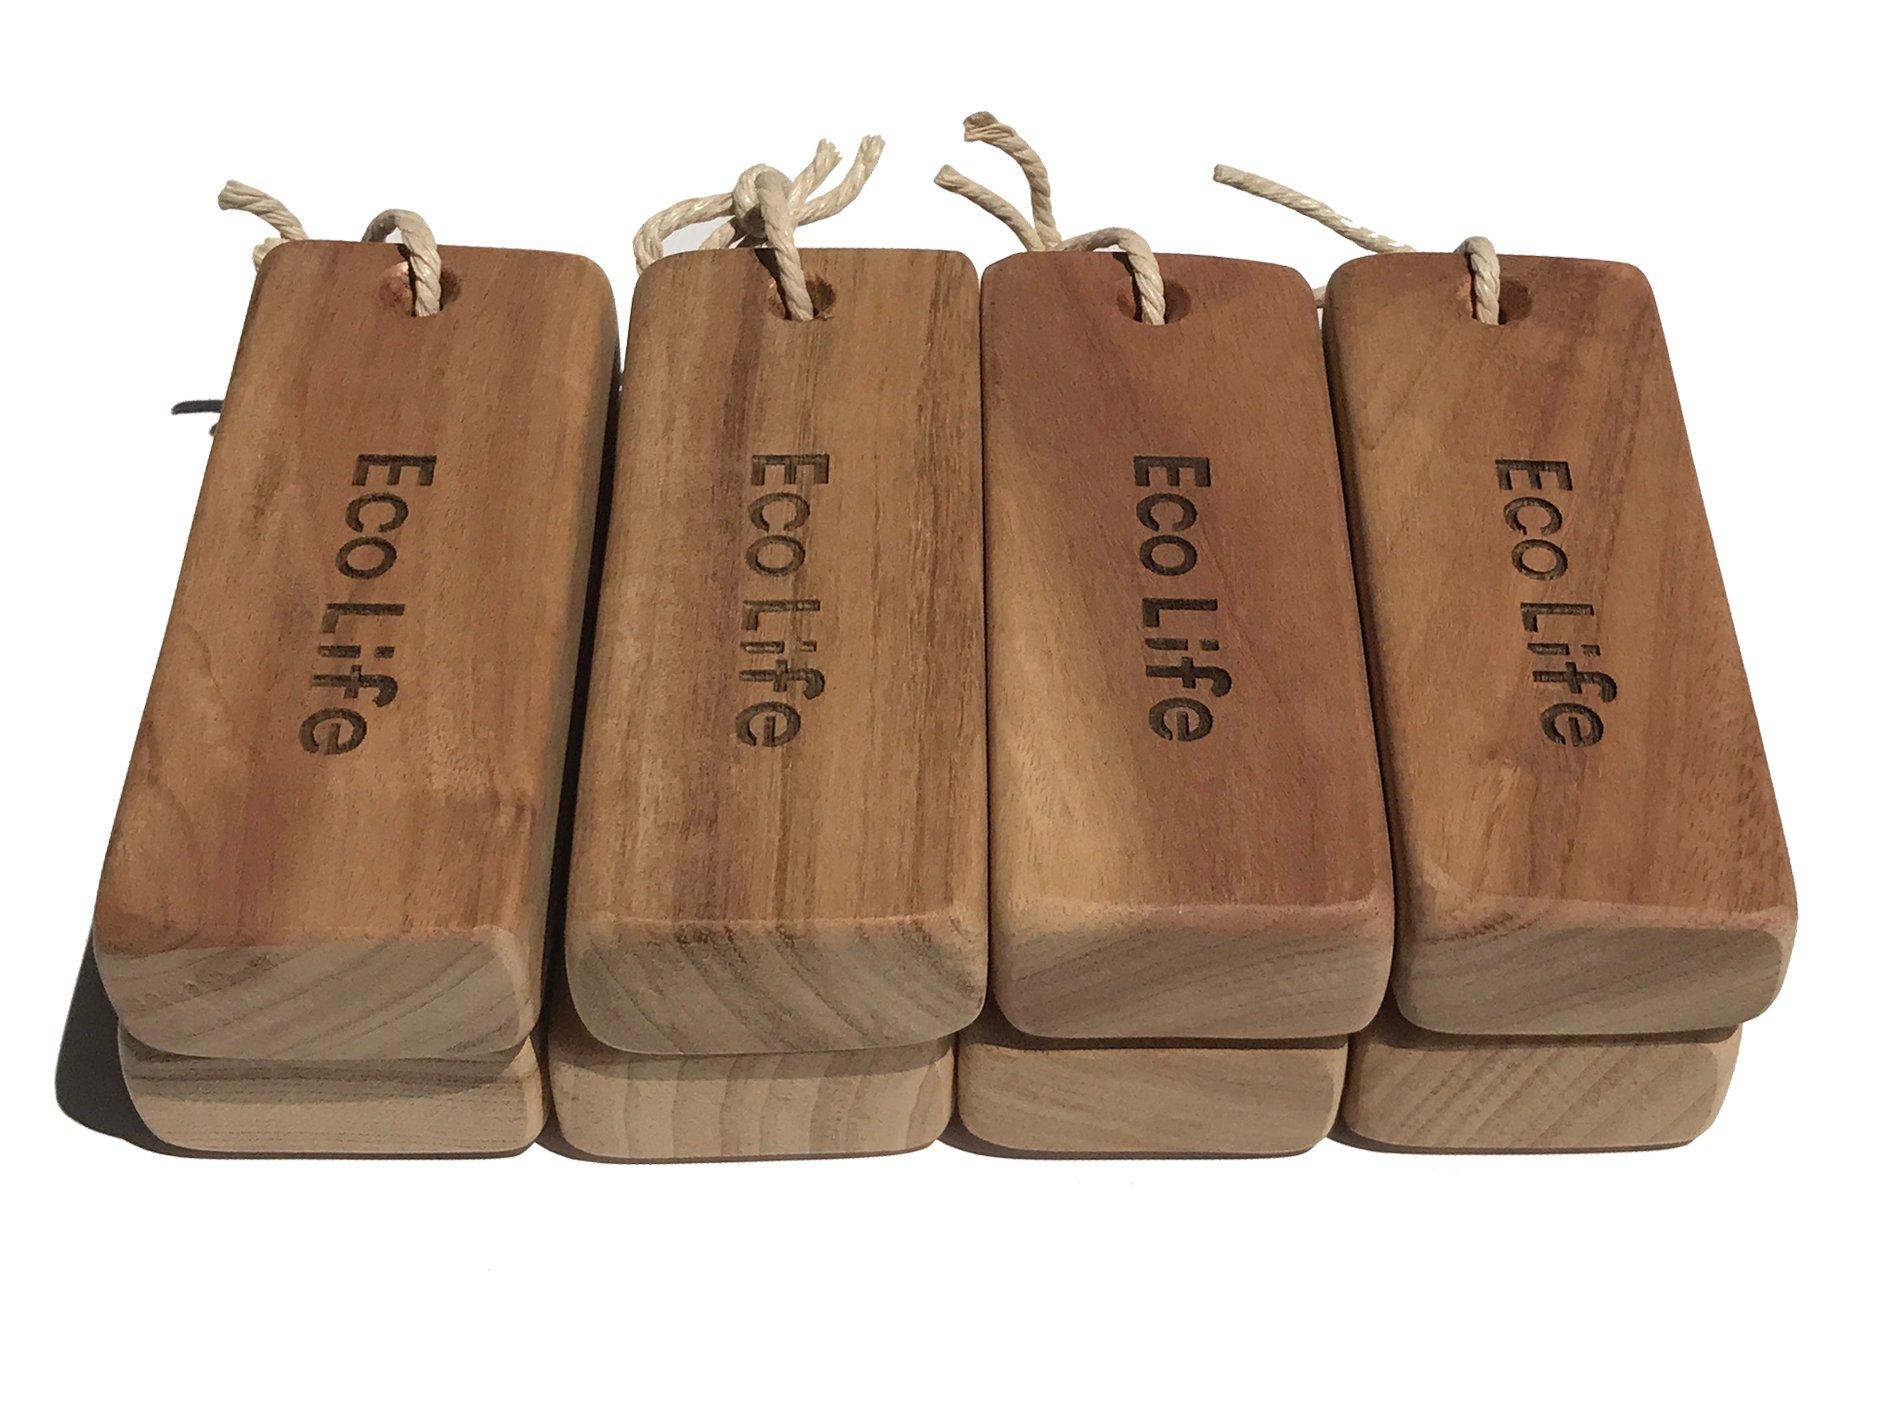 Edland Natural Moth Repellent - Old Cinnamomun Camphora Wood Root Blocks Aromatic Non-Toxic Moth Protection Repel Pests for Closet & Wardrobes - 8 Pcs Big 3.9 x 1.6 x 0.8 in